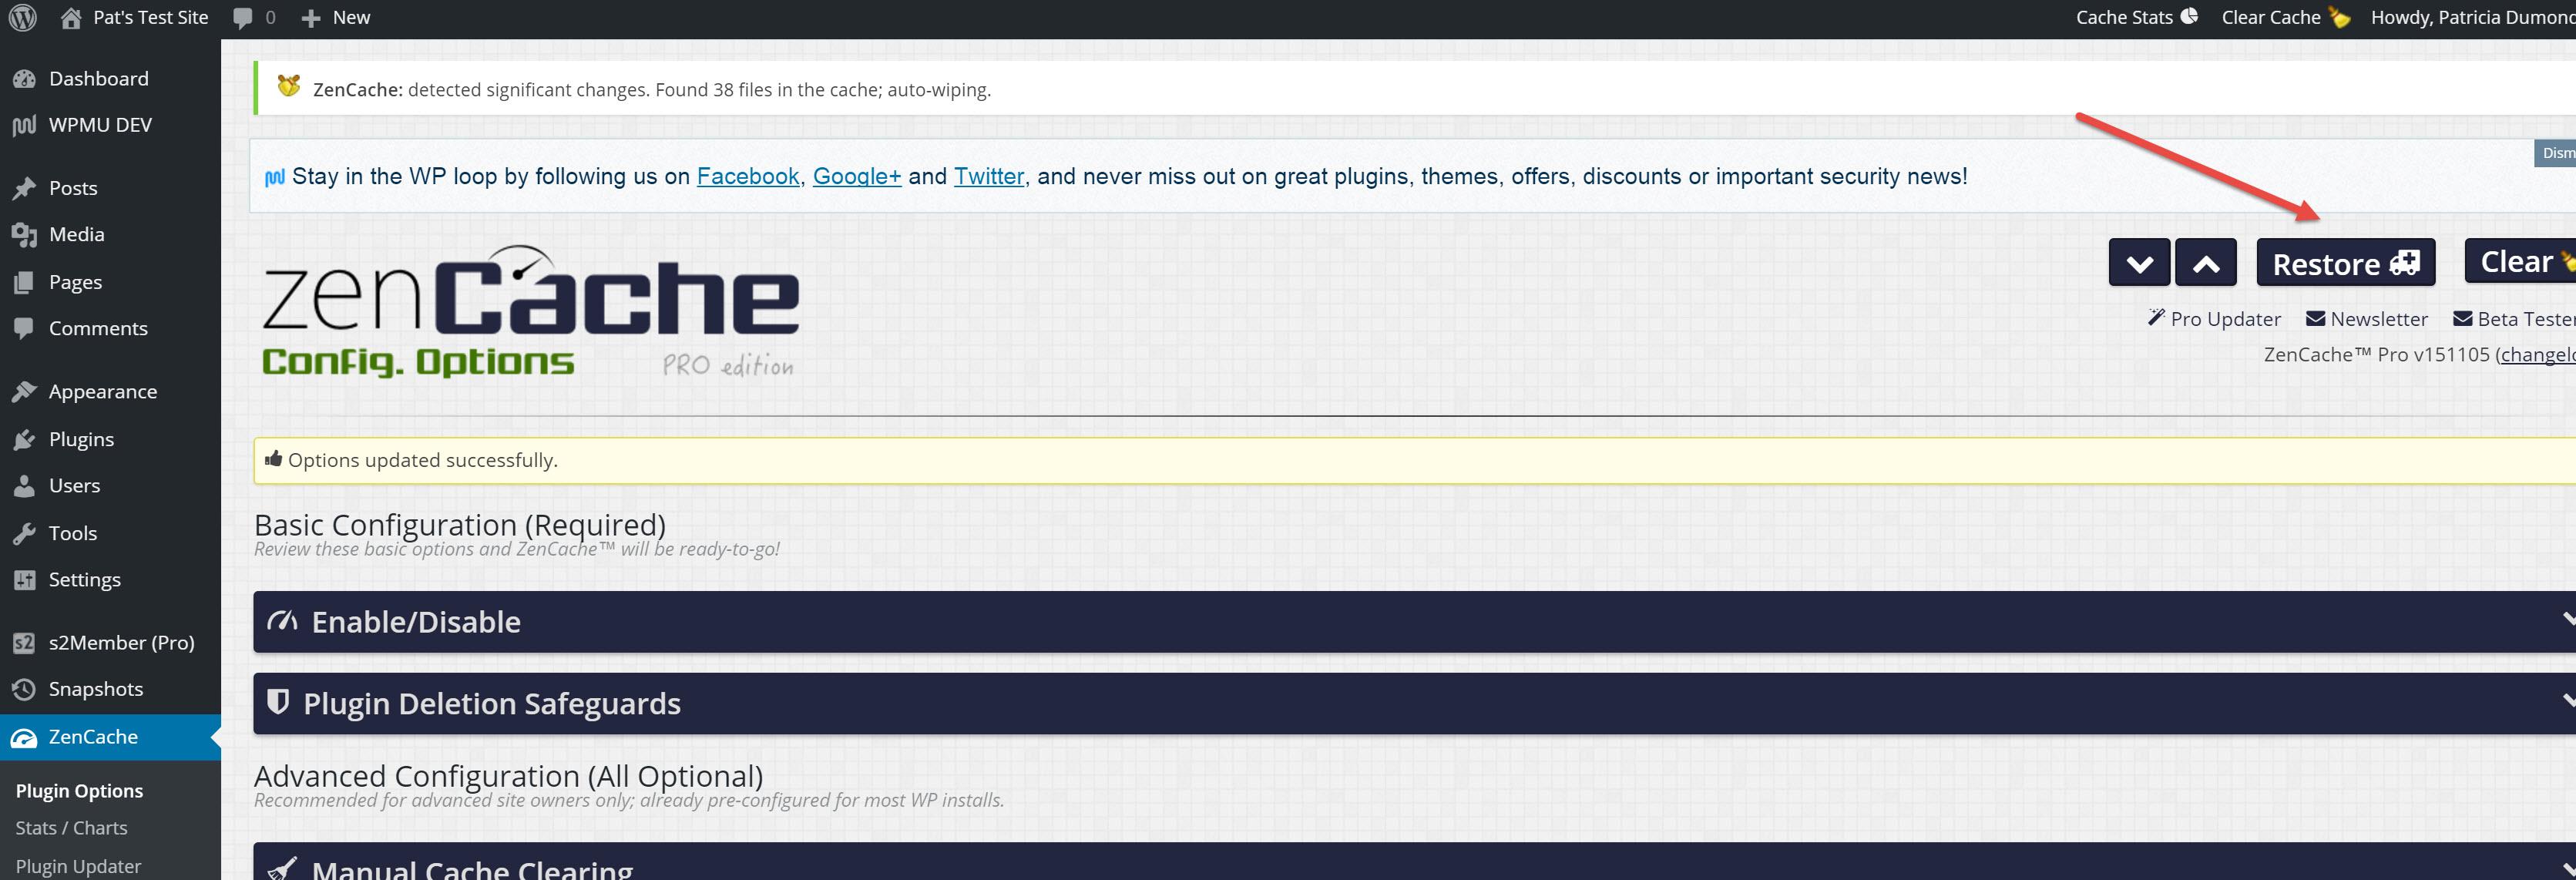 ZenCache Options Page - Restore Button Location